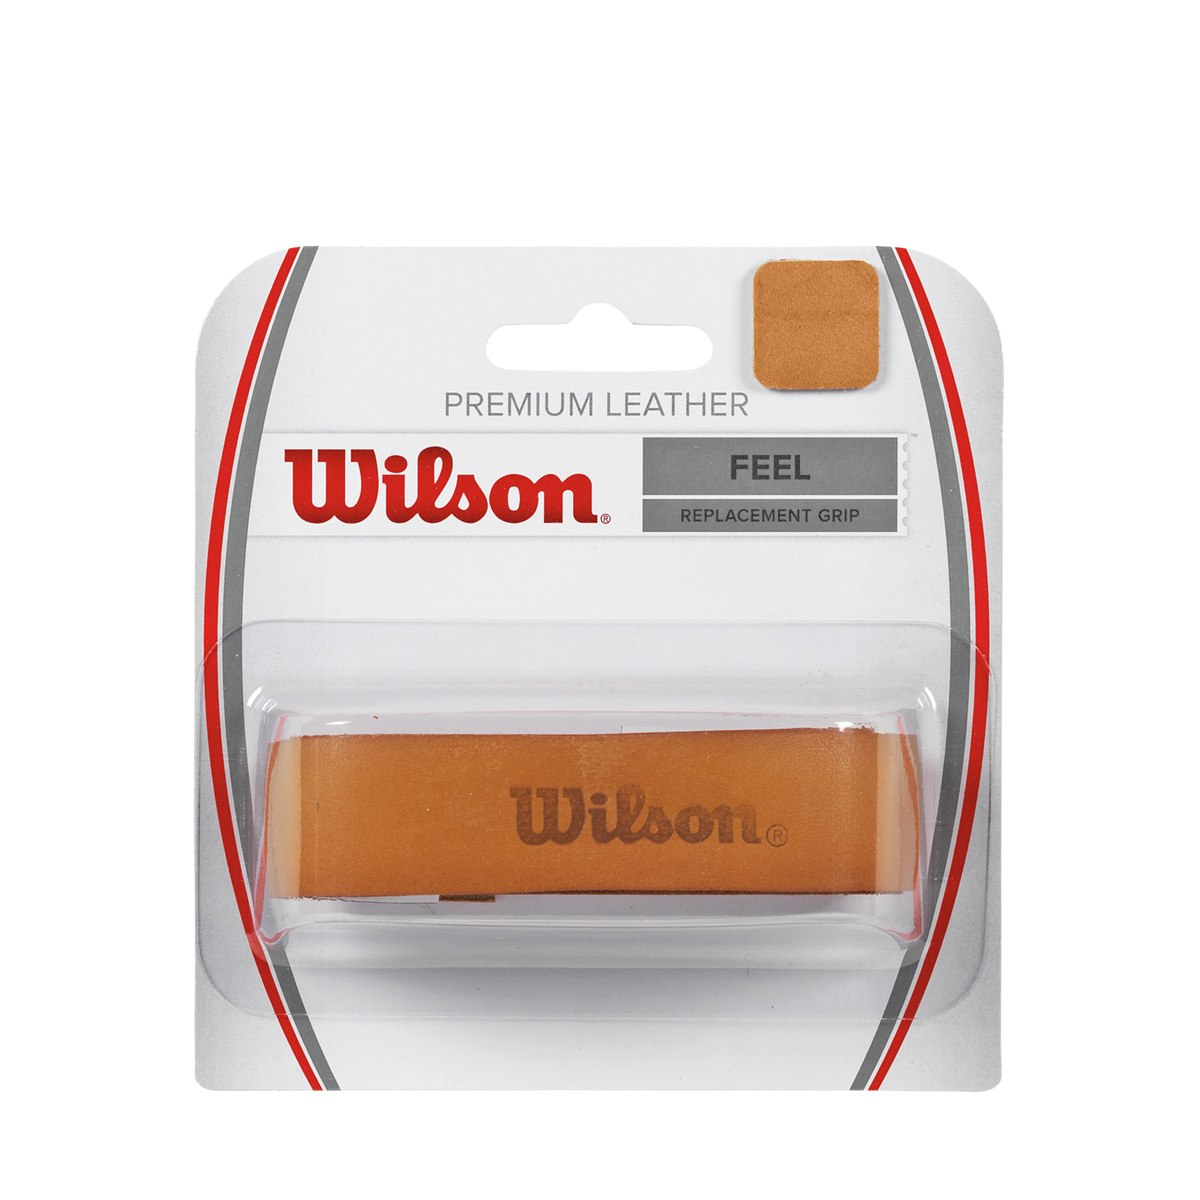 Wilson Leather Natural עורית מעור טבעי